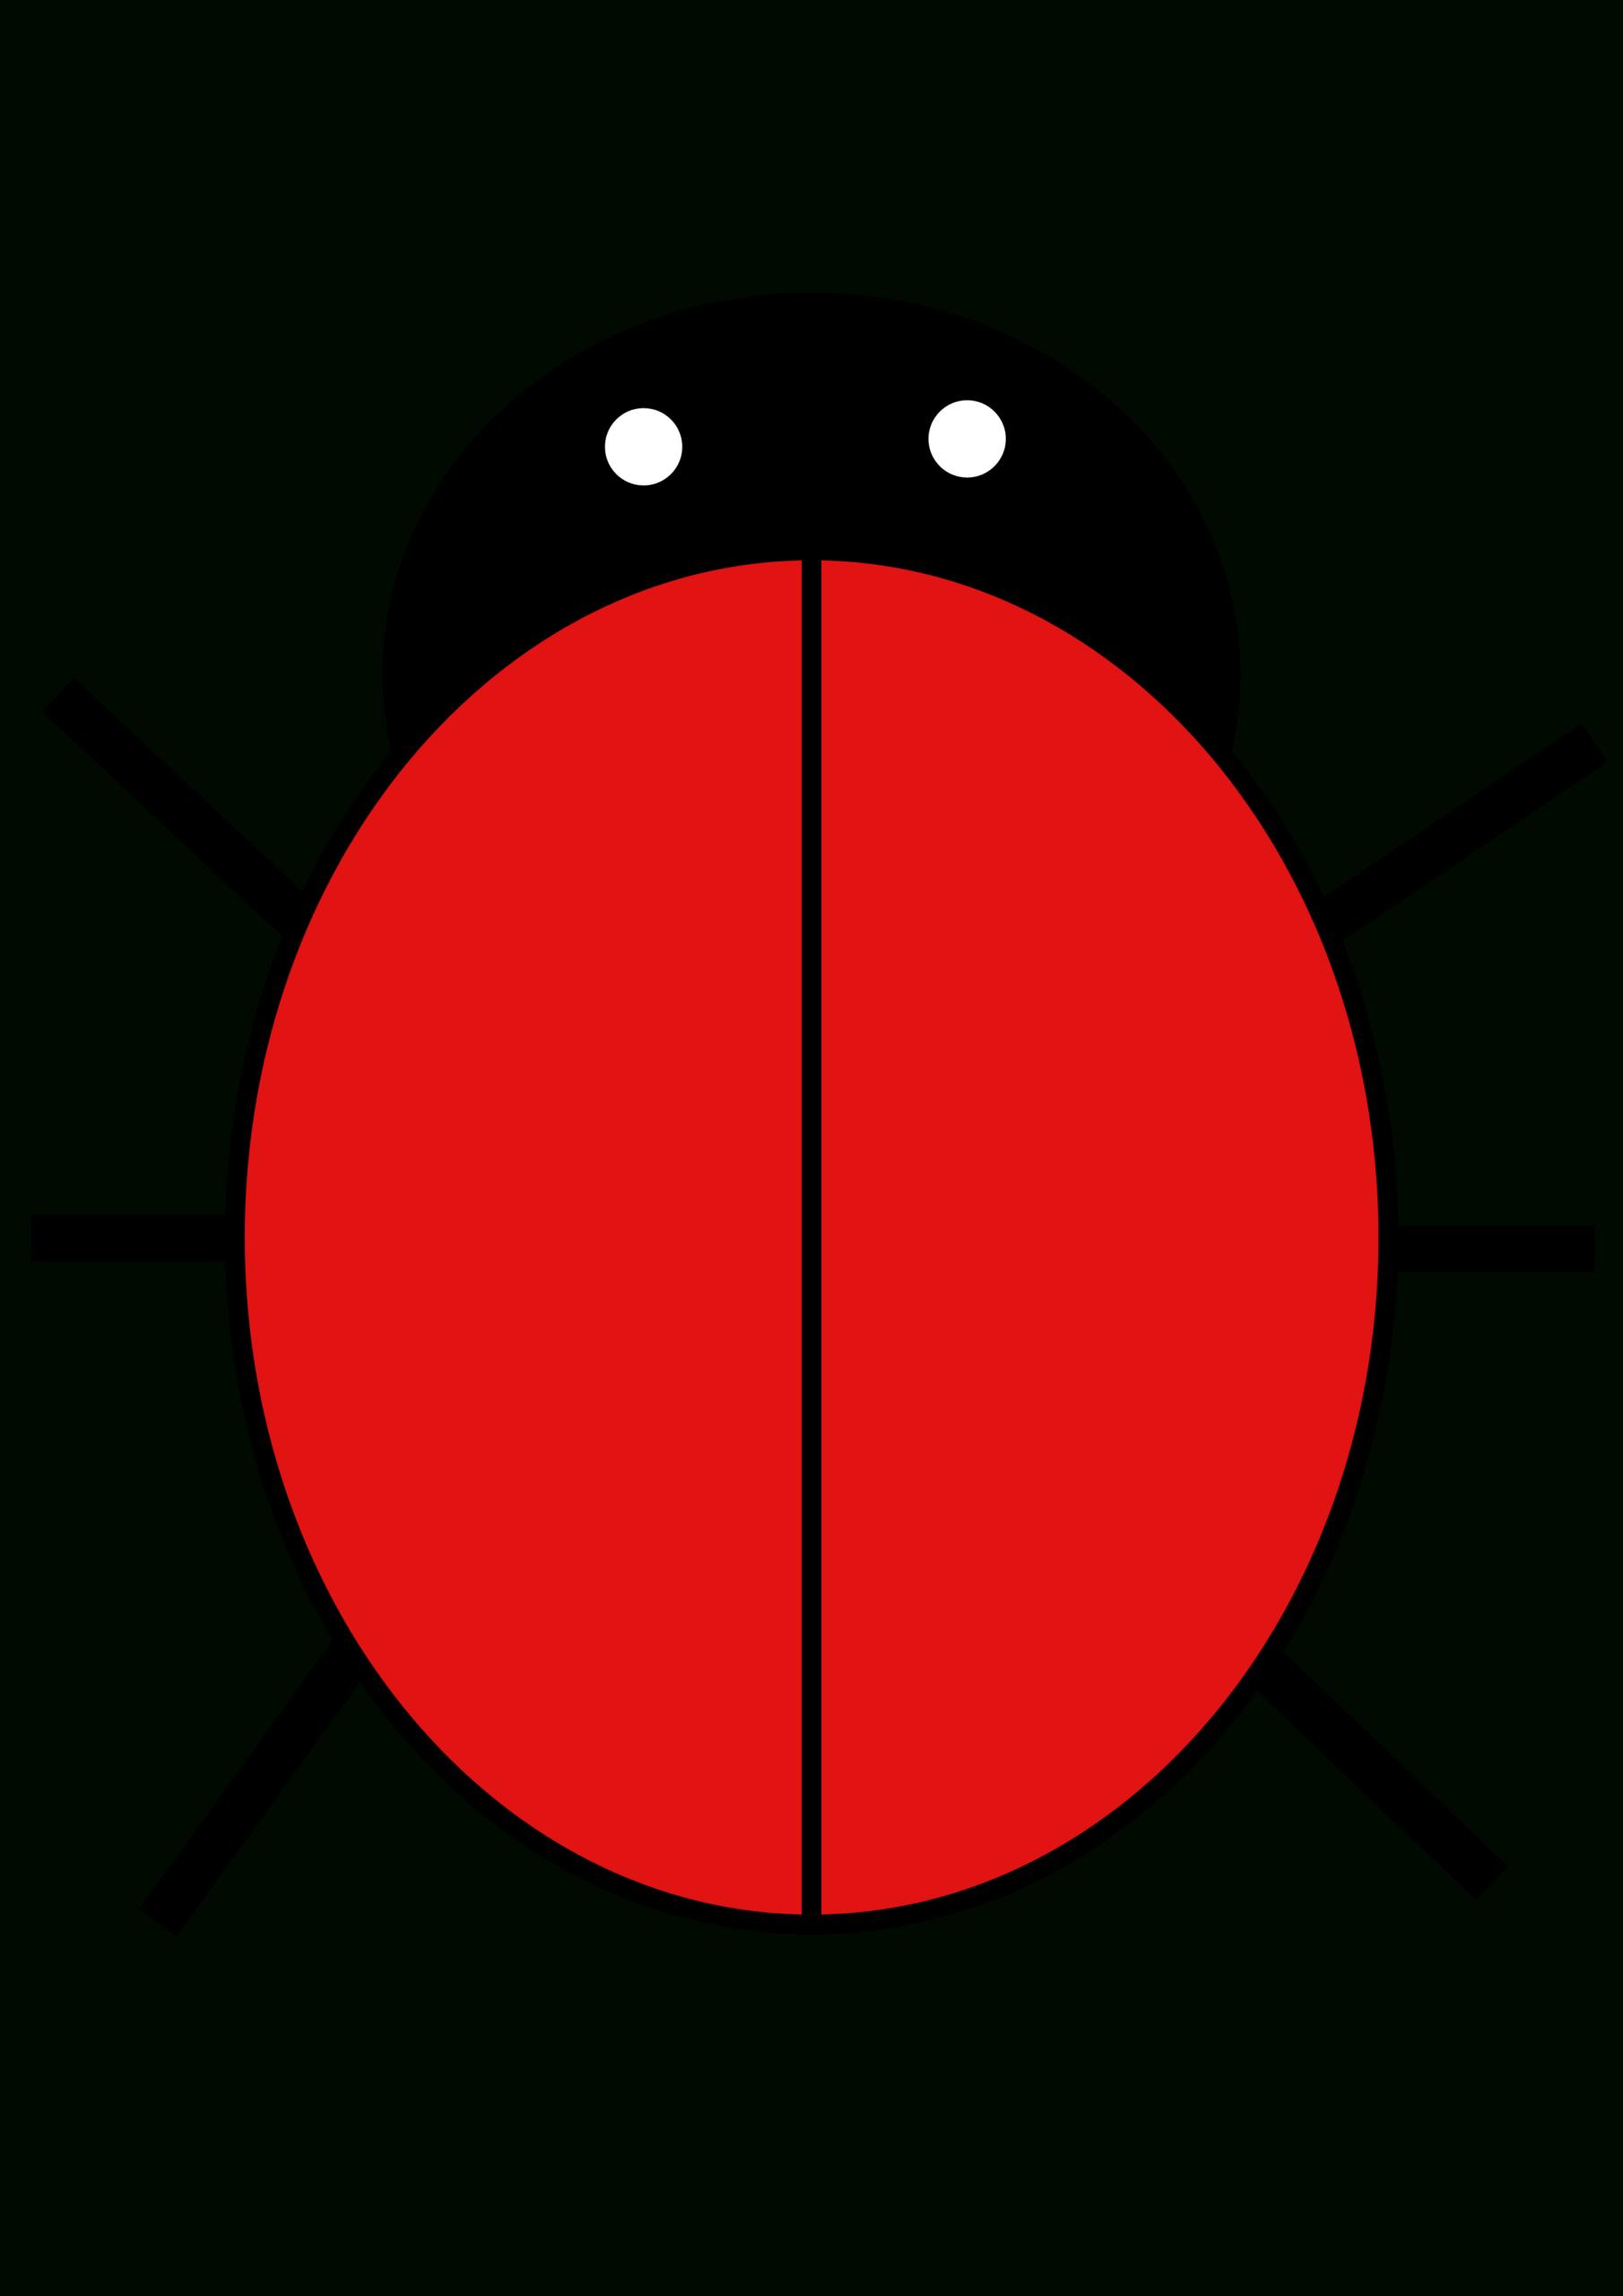 Ladybird | Free Images At Clker - Vector Clip Art Online Regarding Blank Ladybug Template